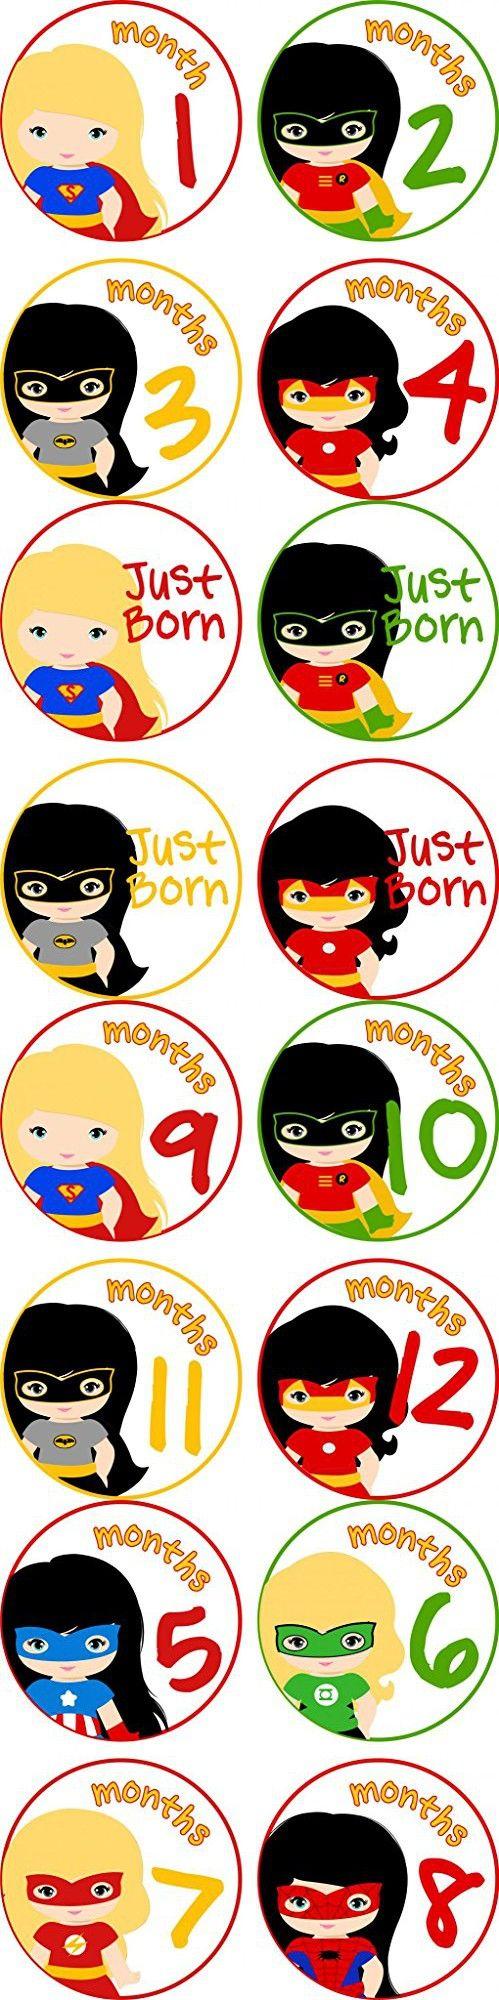 Little LillyBug Designs - Monthly Baby Stickers - Super Hero Girls